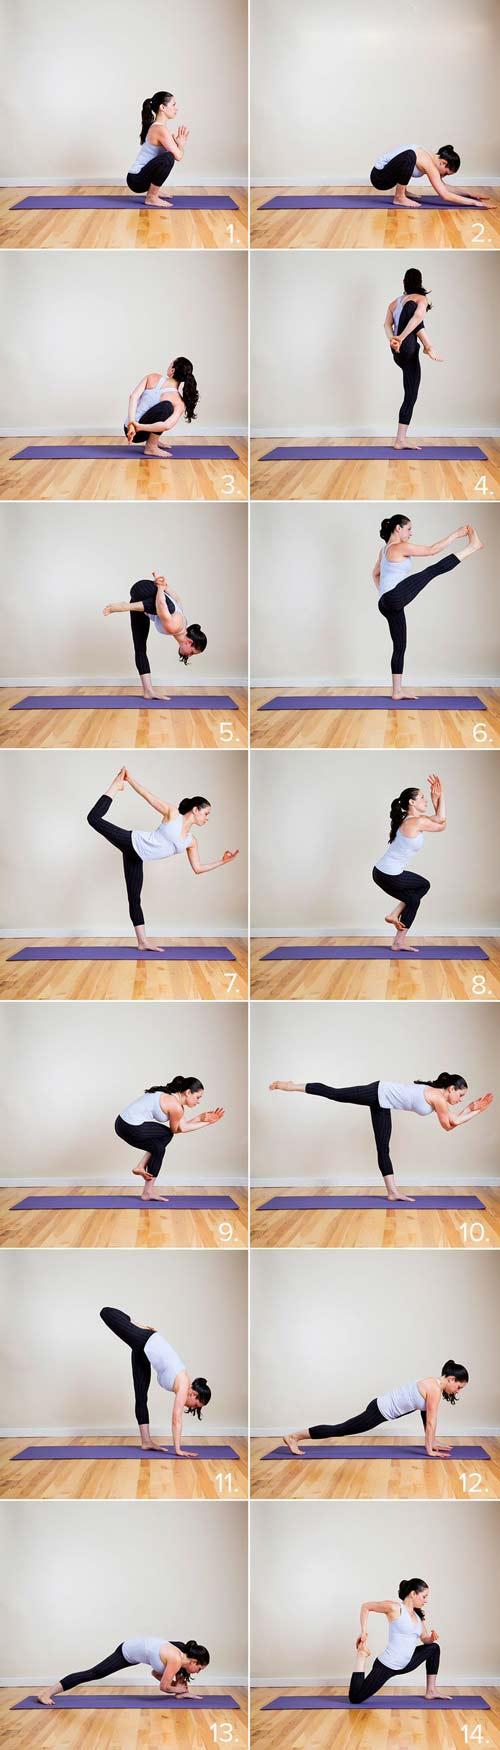 yoga-12-12-5